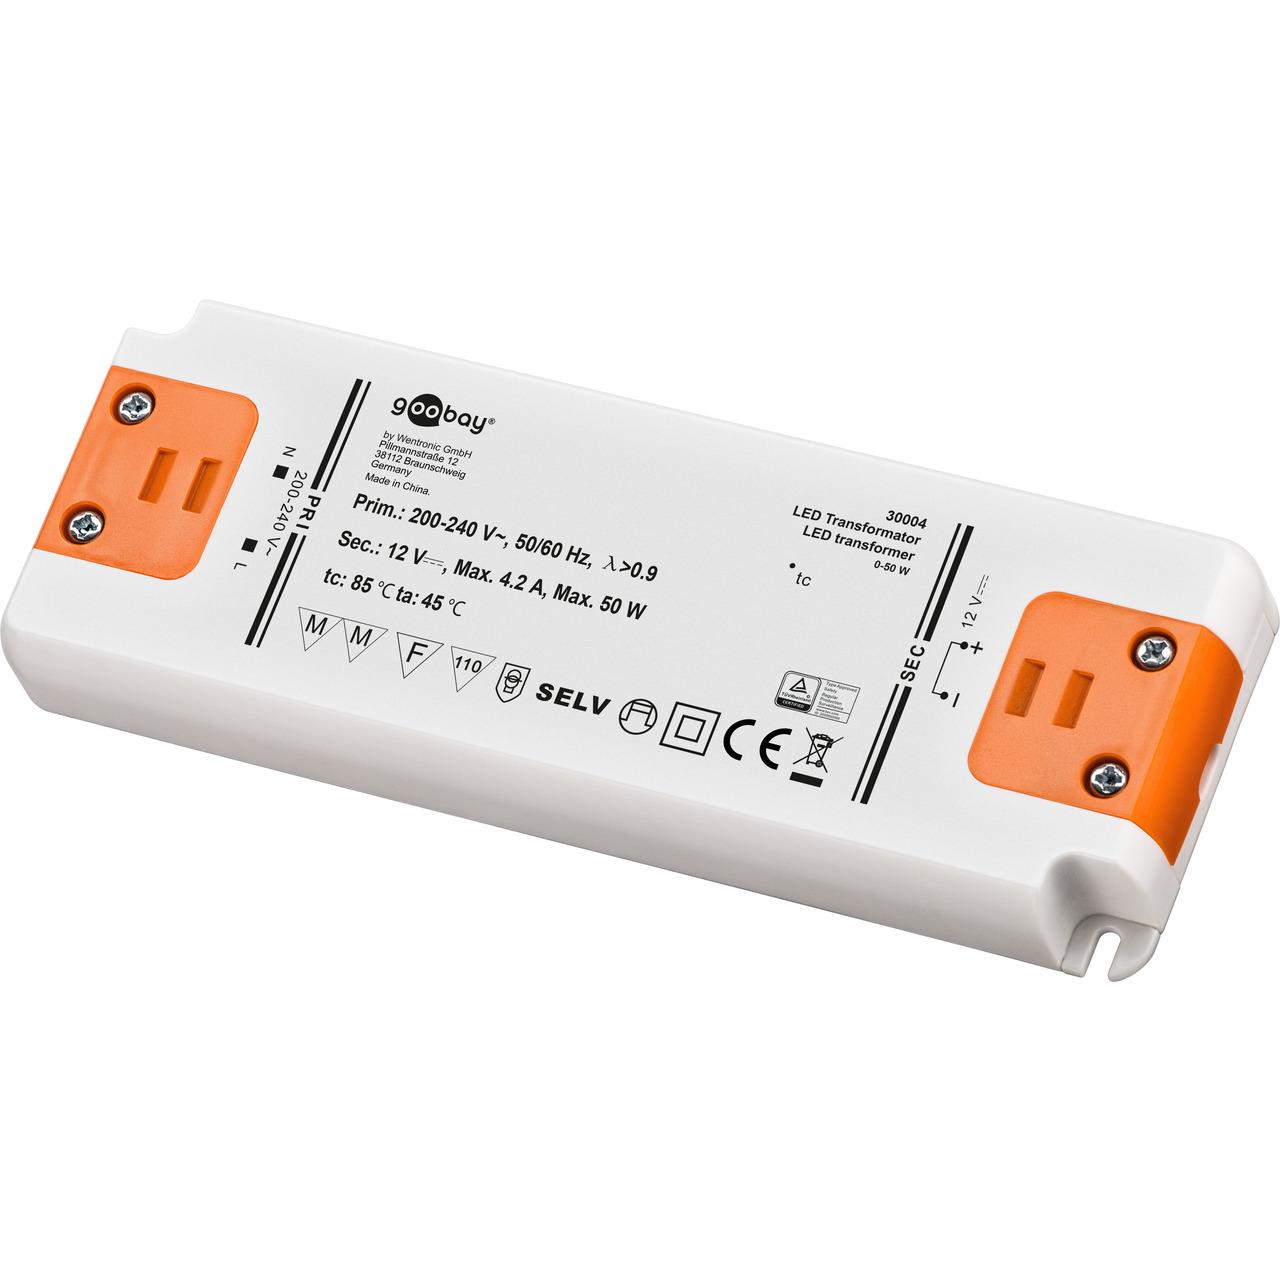 50-W-LED-Netzteil superflach- 12 V DC